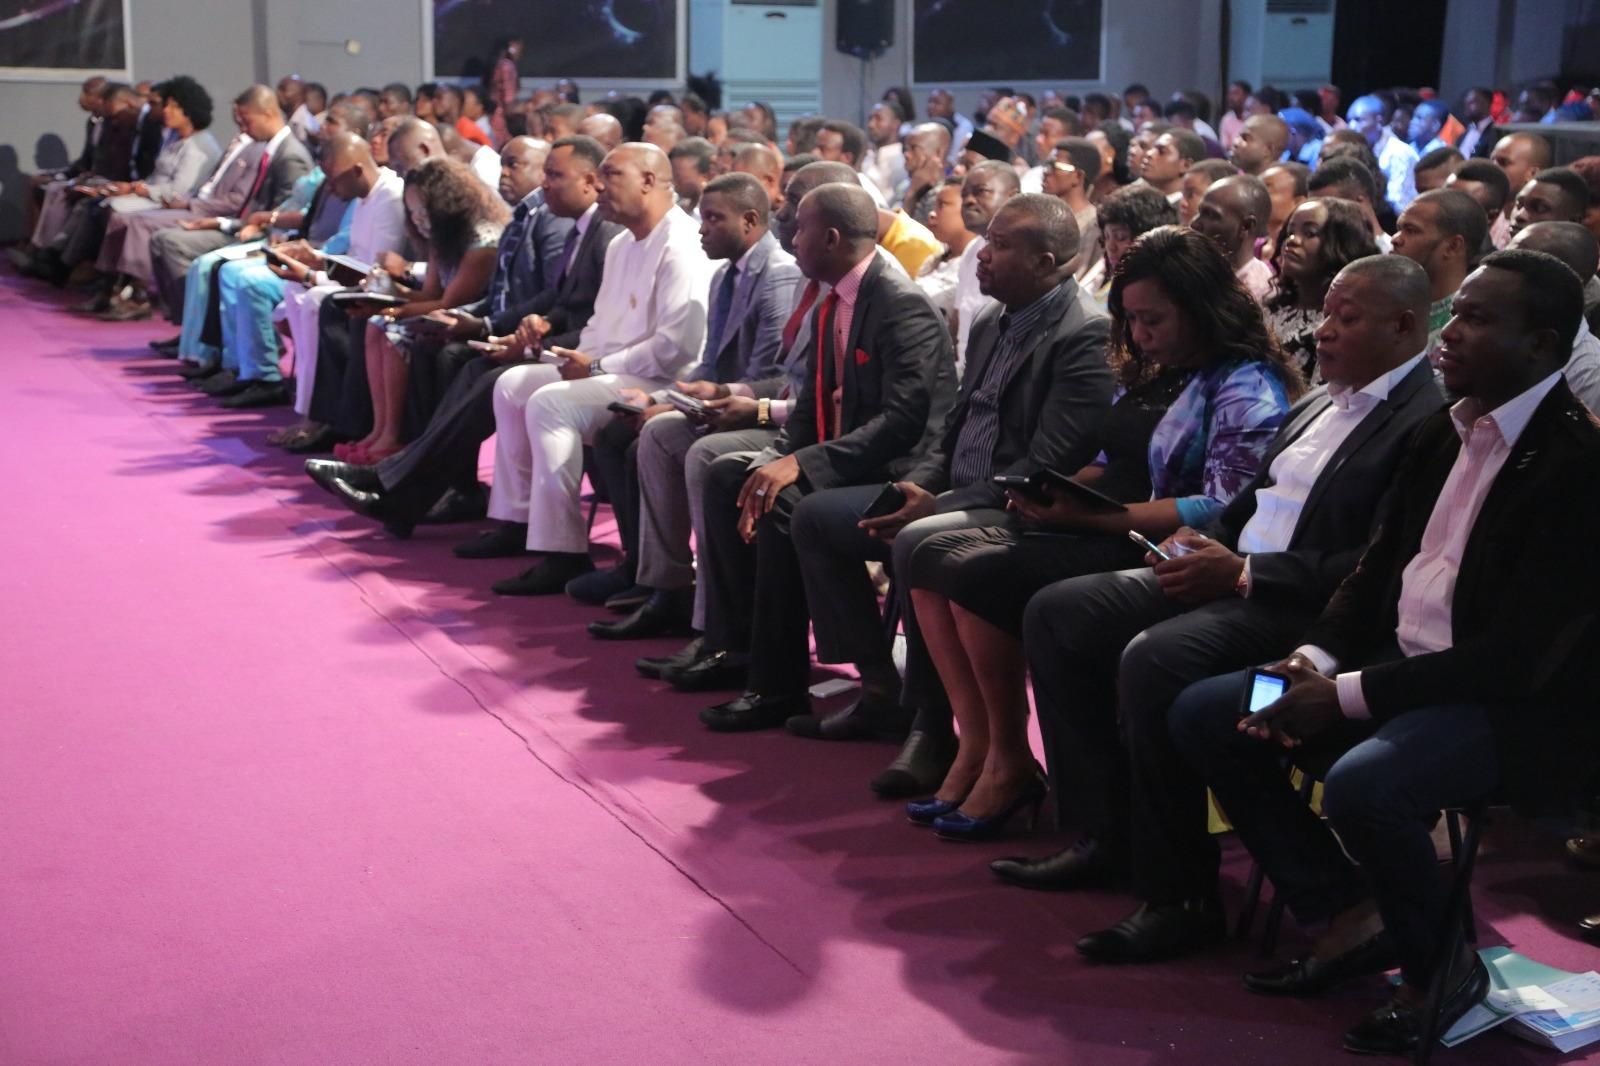 Highlights of Church 1A service